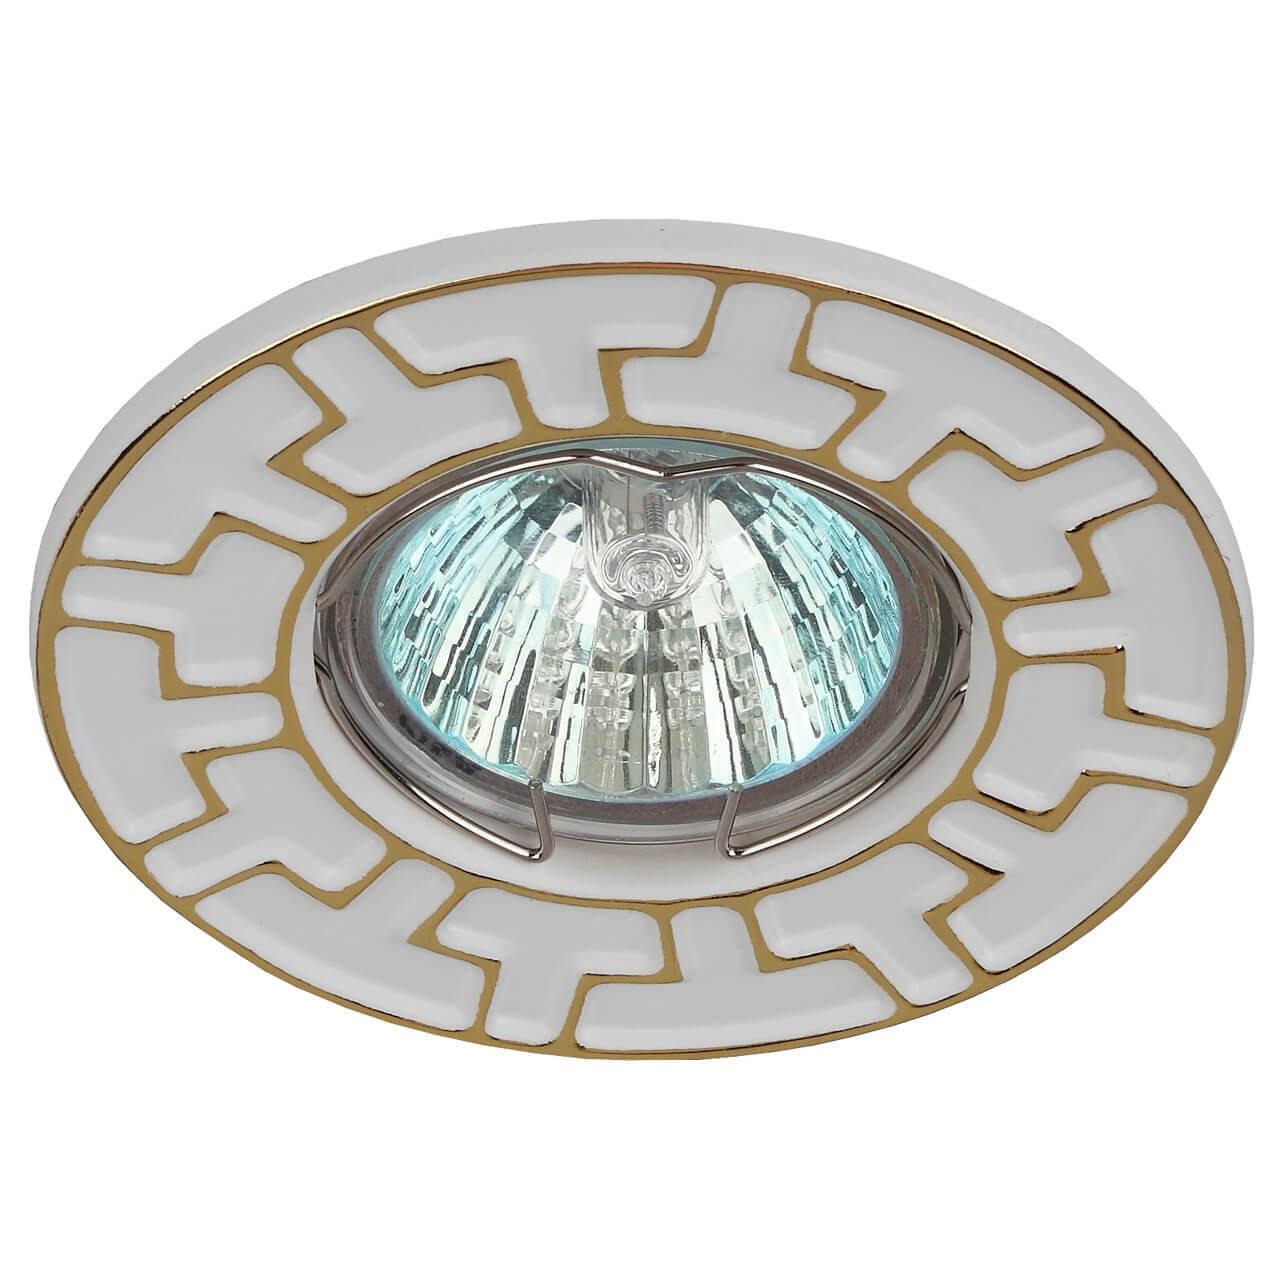 все цены на Встраиваемый светильник ЭРА Штампованный ST5 GD/WH онлайн